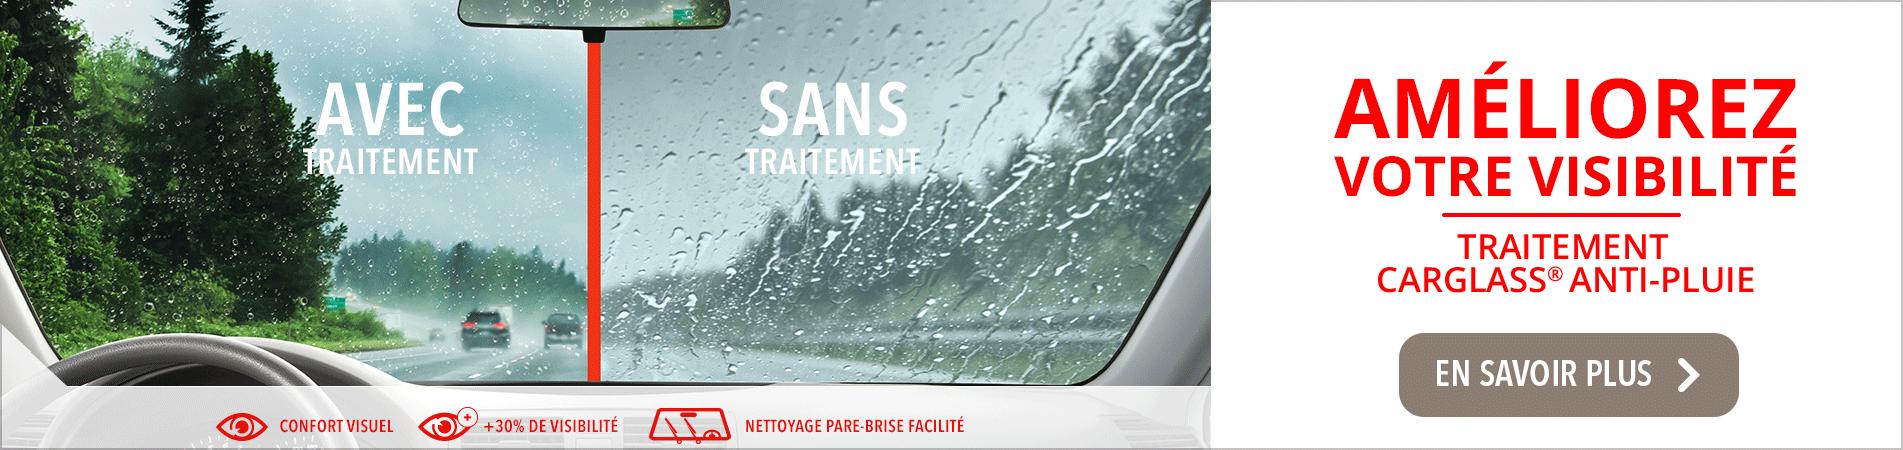 carglass® traitement carglass anti-pluie